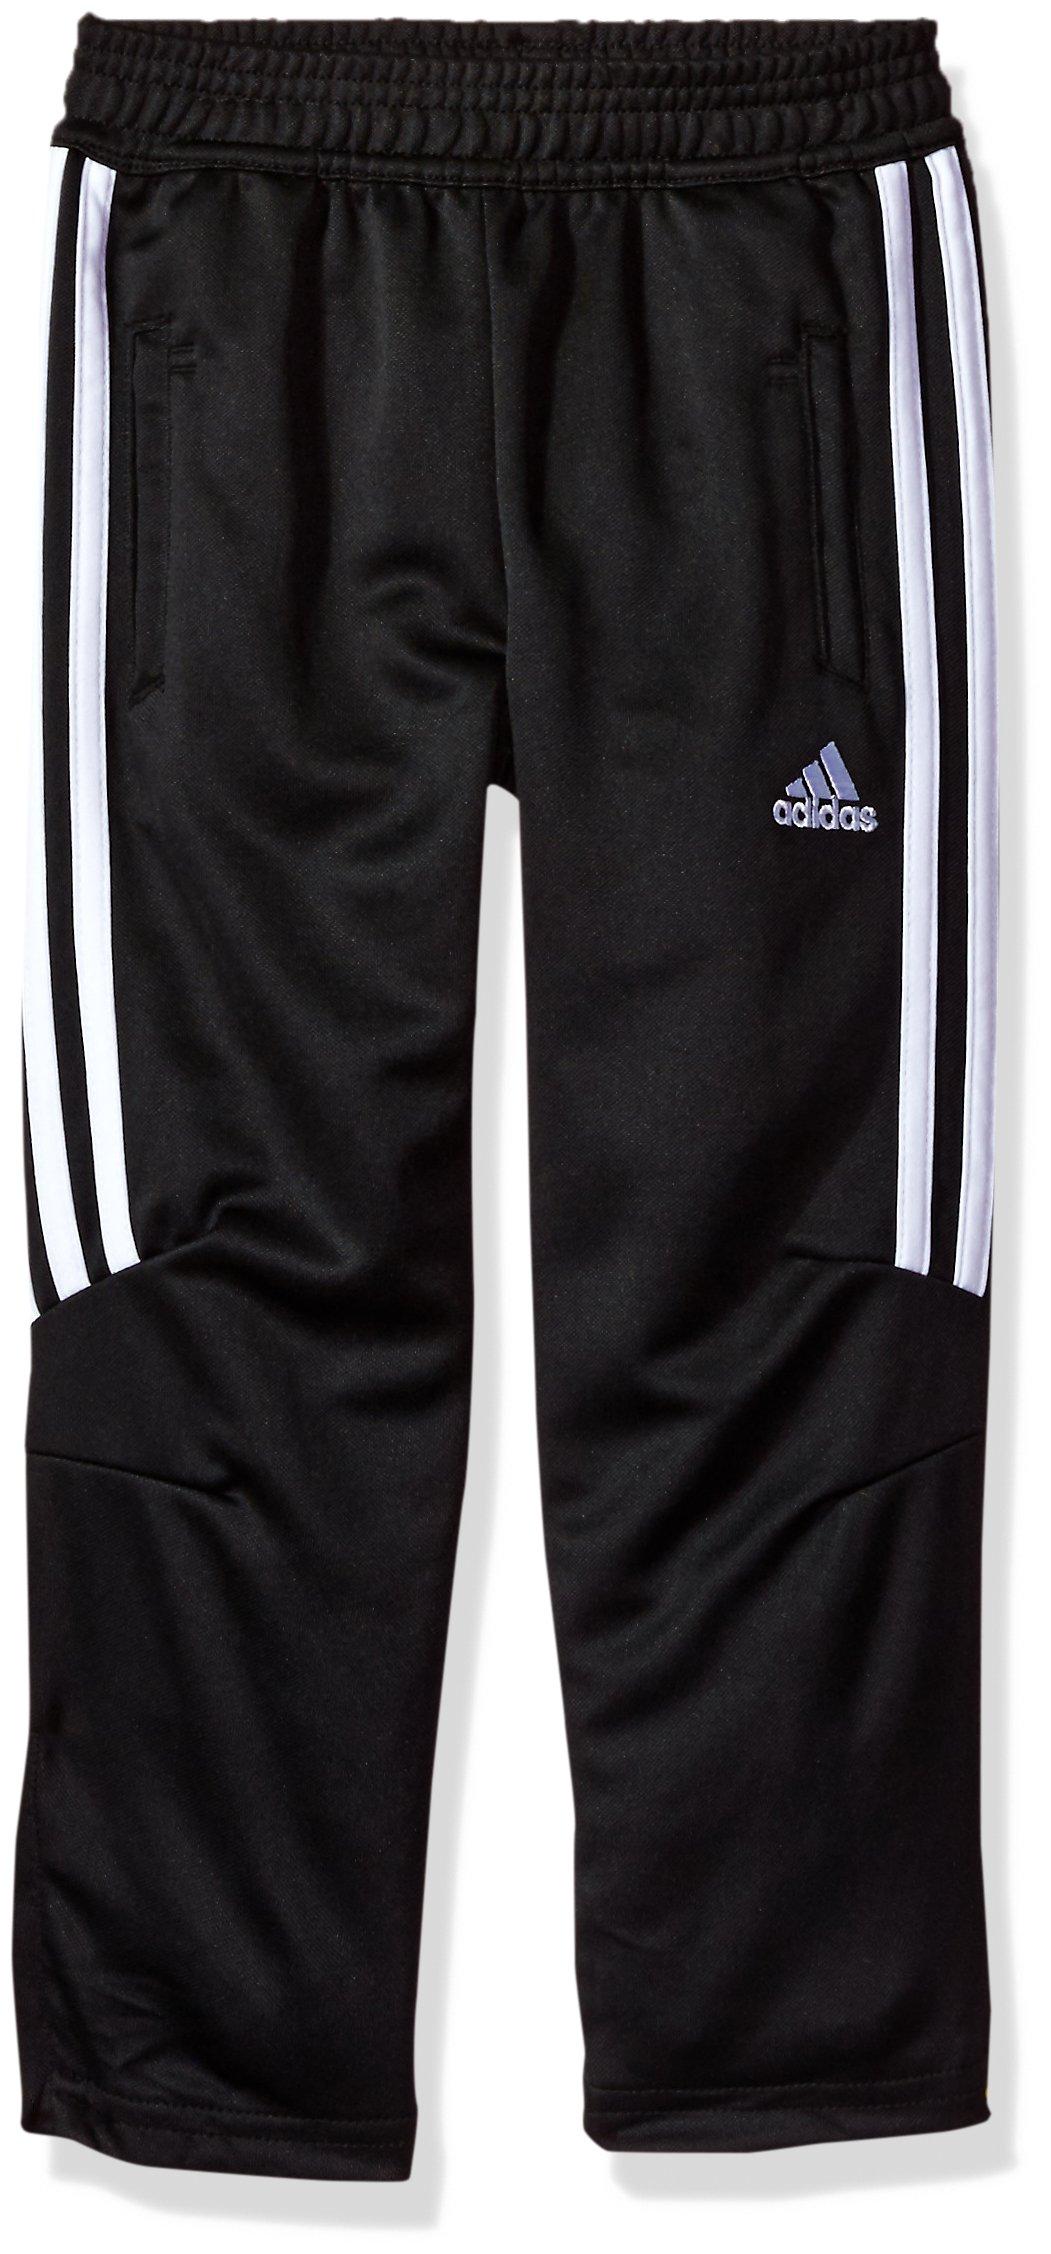 adidas Boys' Little Climacool Tiro Pant, Tiro17 Black Half, 7 by adidas